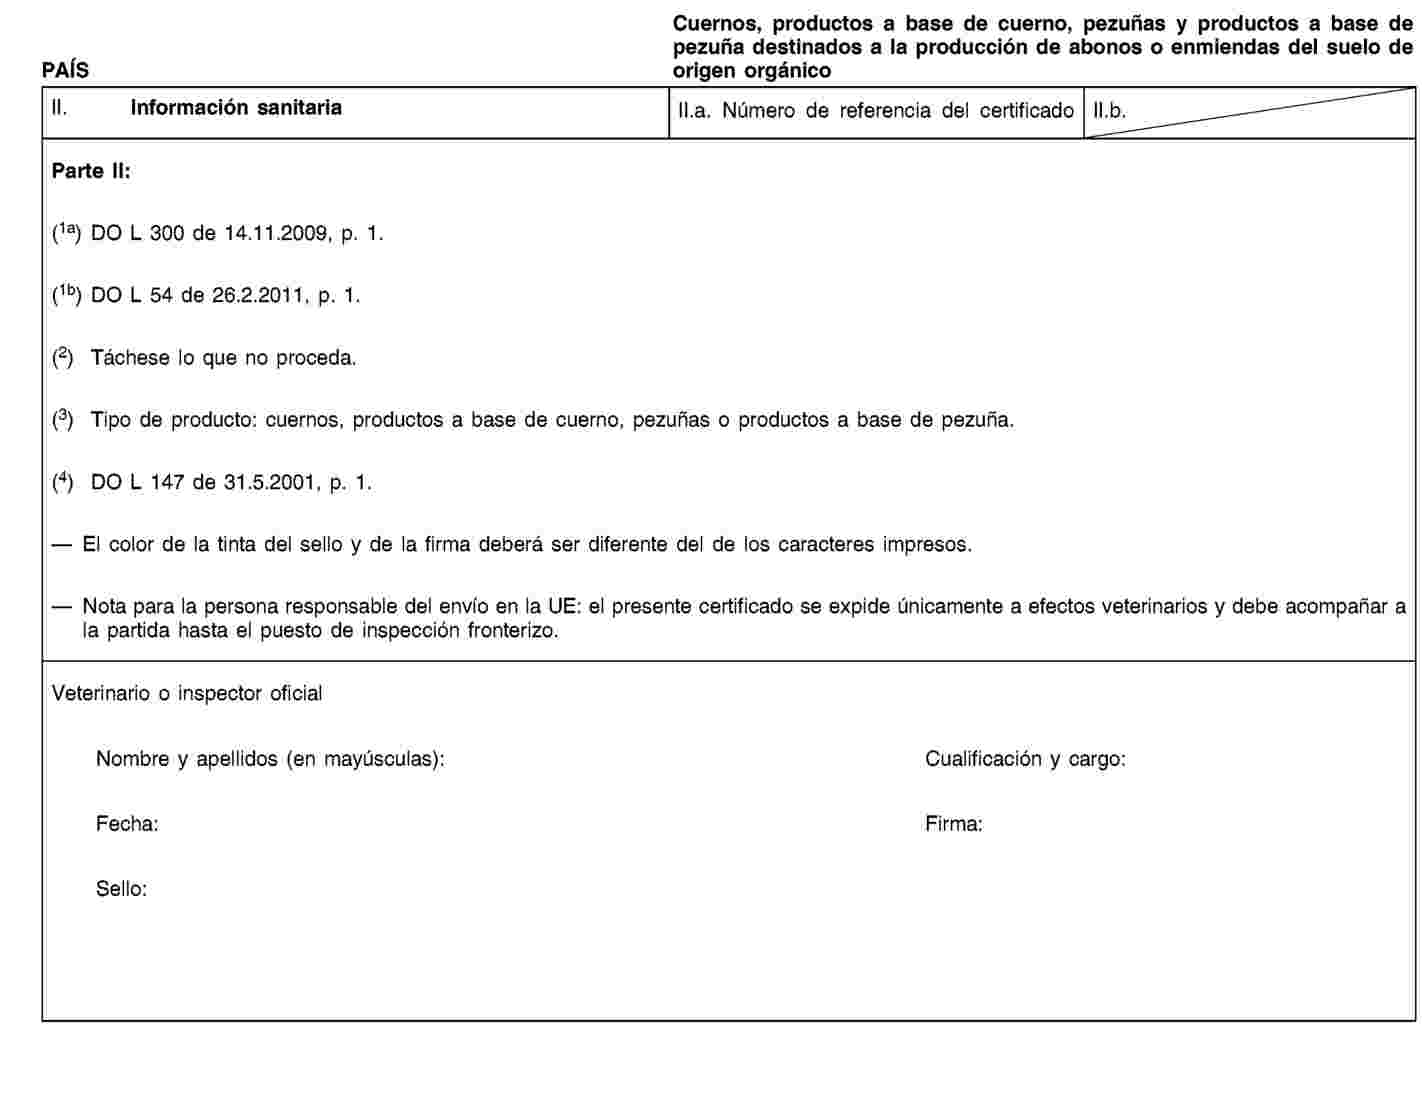 Imagen: https://eur-lex.europa.eu/resource.html?uri=uriserv:OJ.L_.2011.054.01.0001.01.SPA.xhtml.L_2011054ES.01024101.tif.jpg